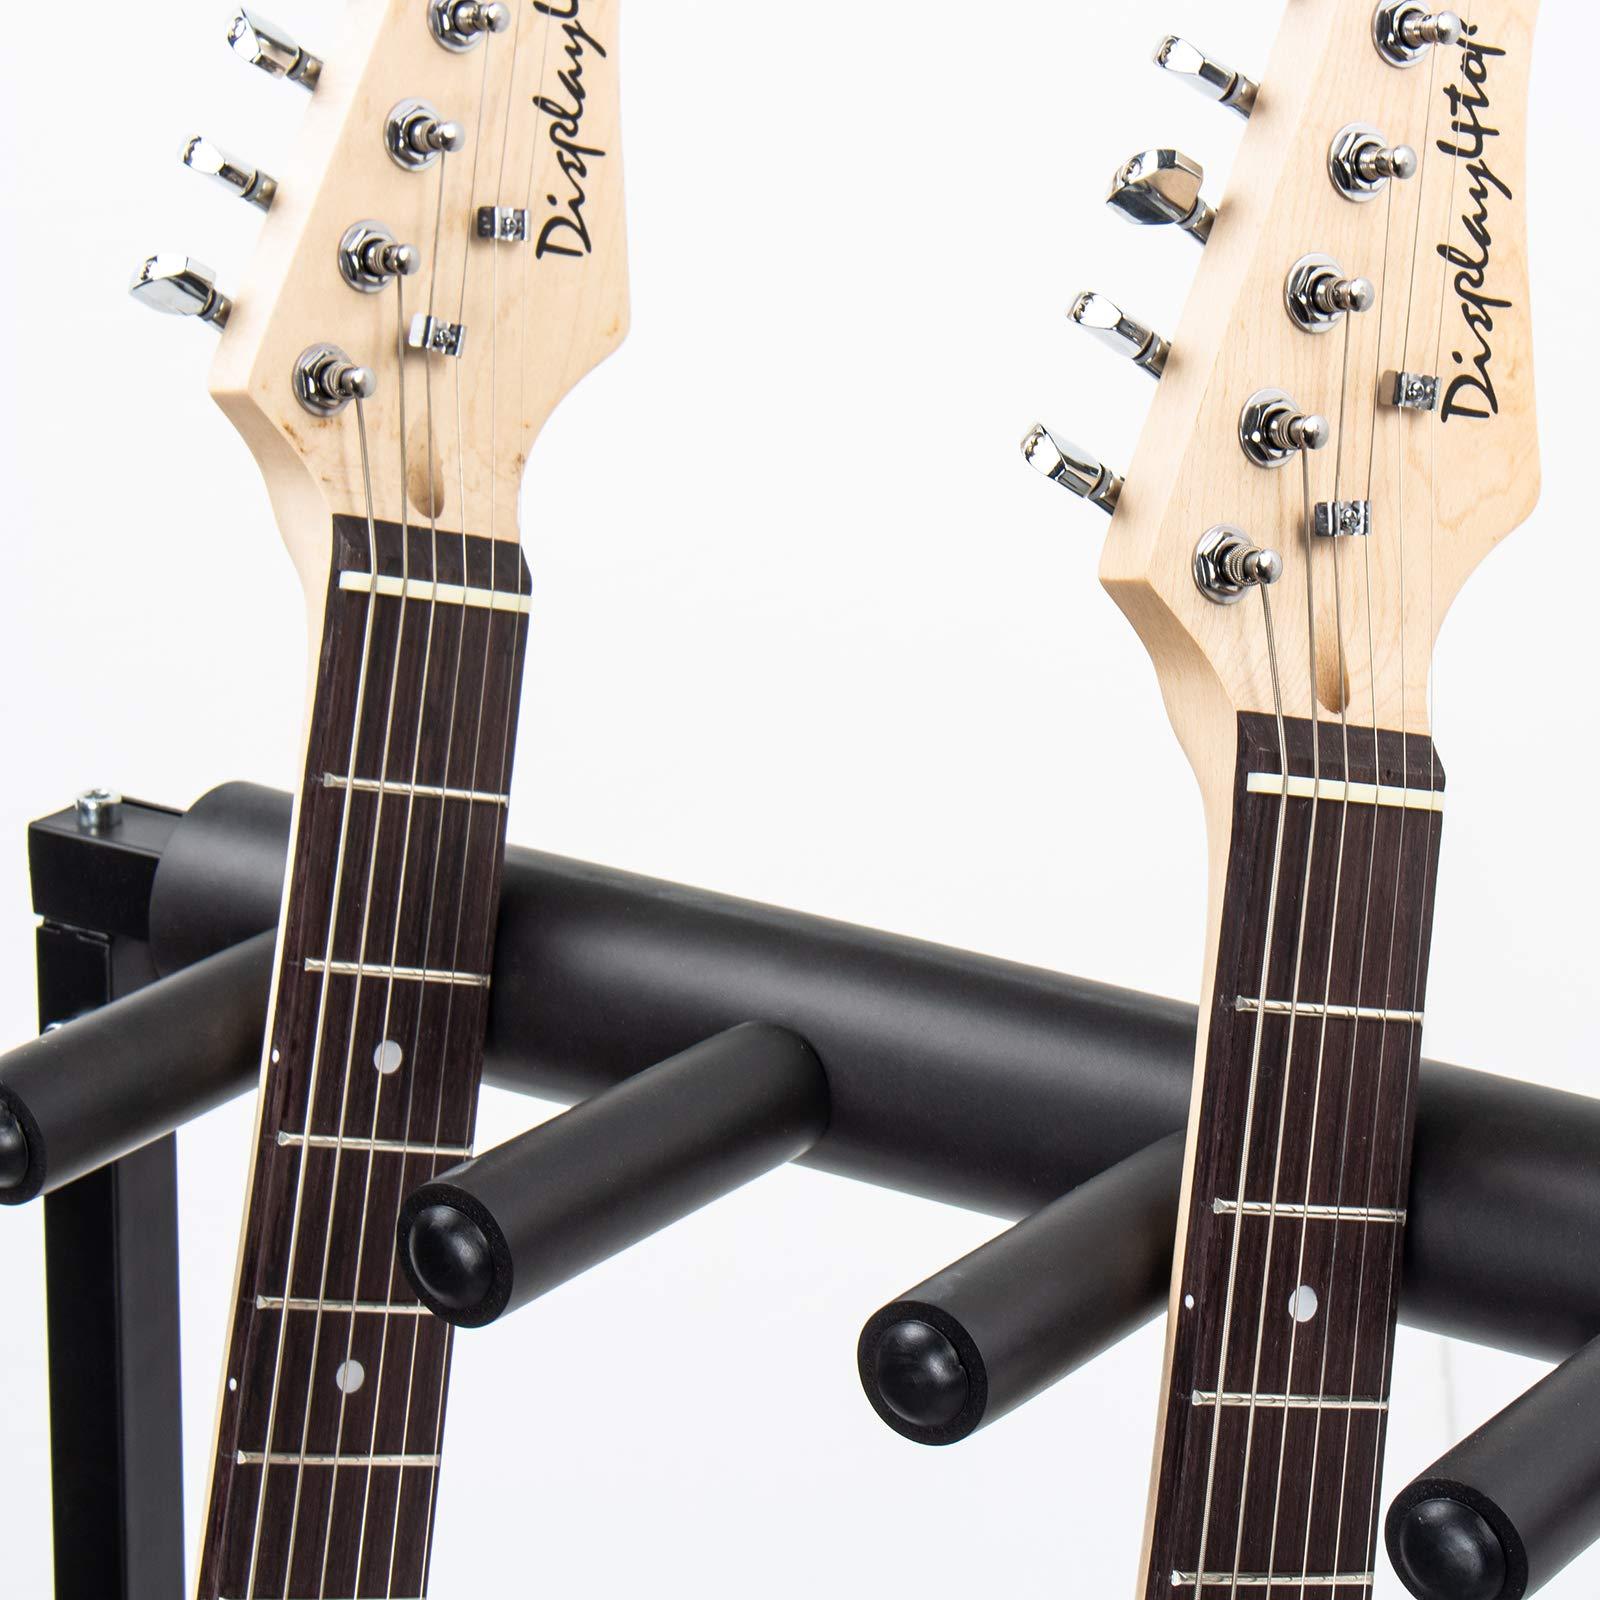 AJO Multi Guitar Stand,7 Holder Guitar Folding Portable Storage Organization Stand Display Rack,Black by AJO (Image #5)